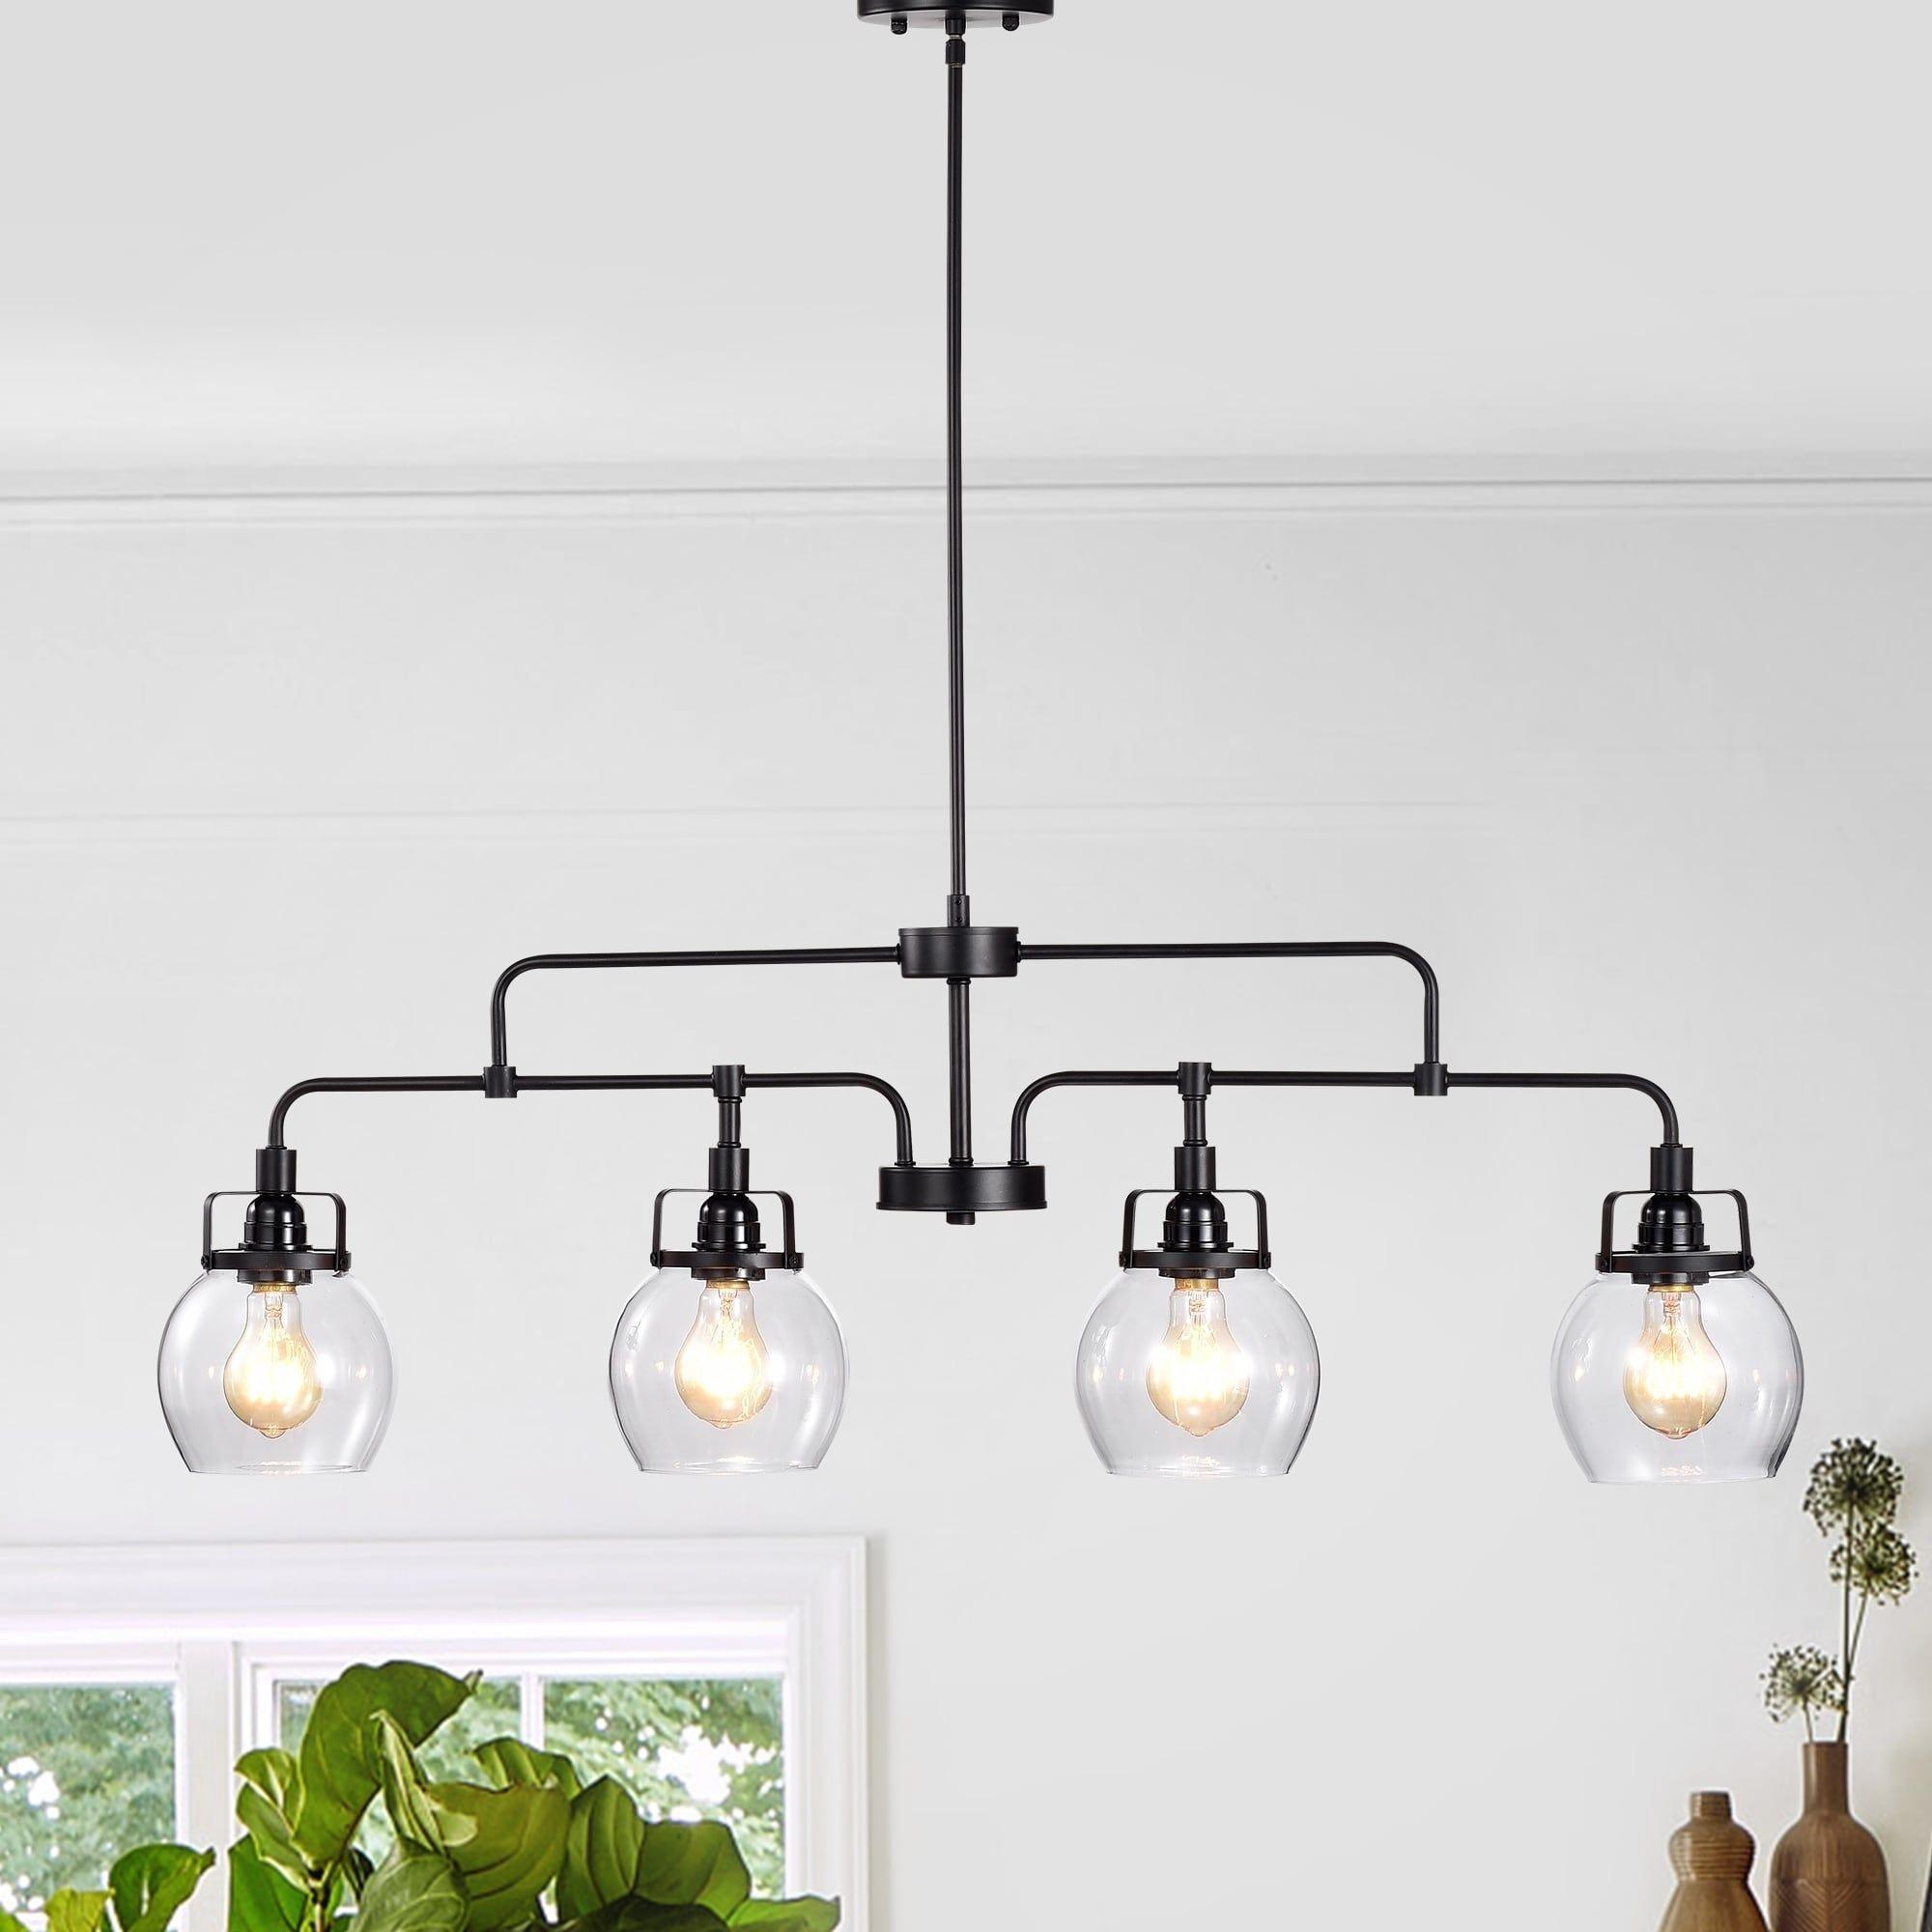 Ceiling Lights Black Chandelier Kitchen Lighting Kitchen Island Pendants Black chandelier for kitchen